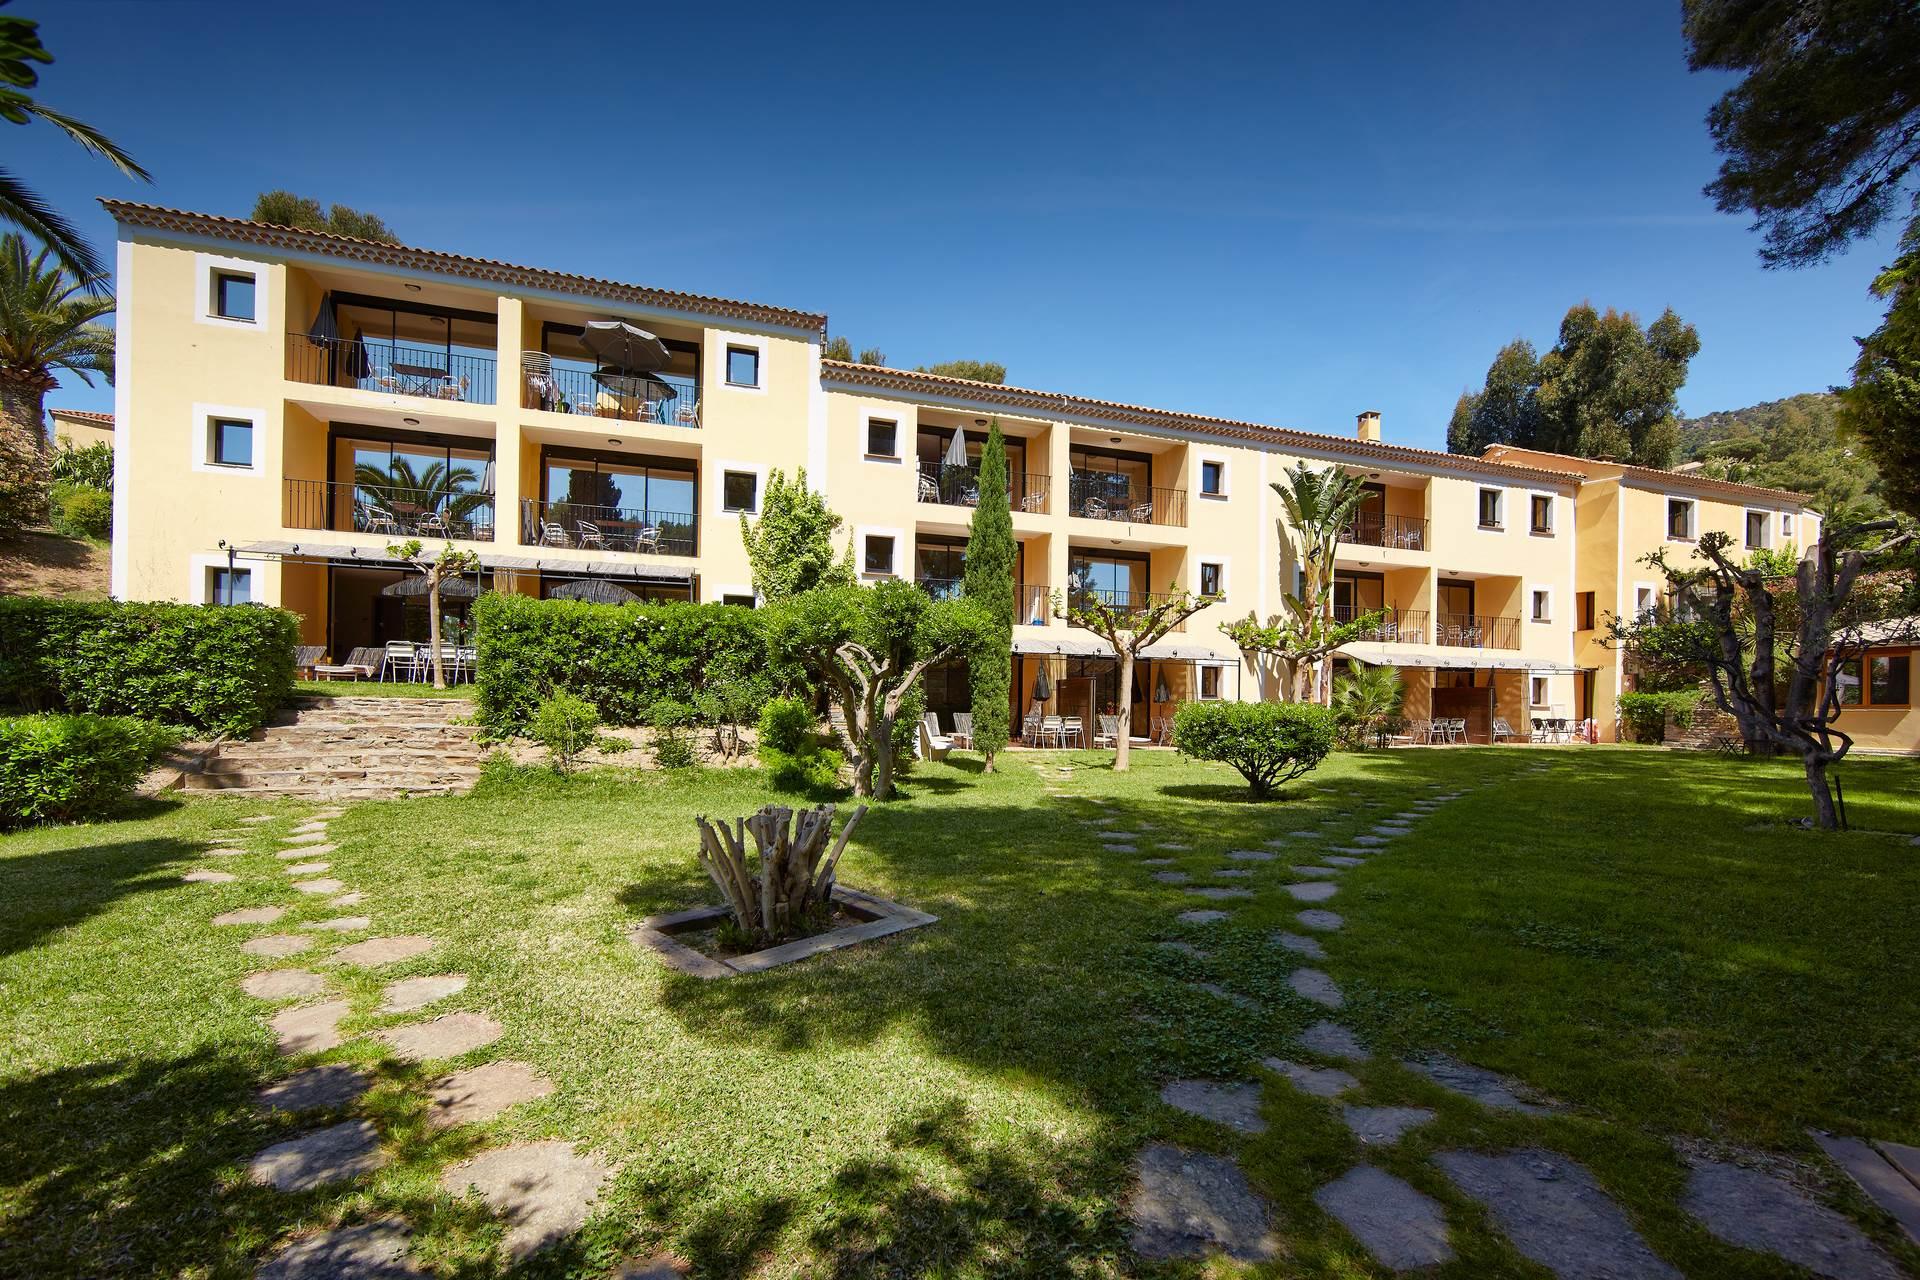 Residence du Bailli au Rayol-Canadel - Residence Saint Tropez